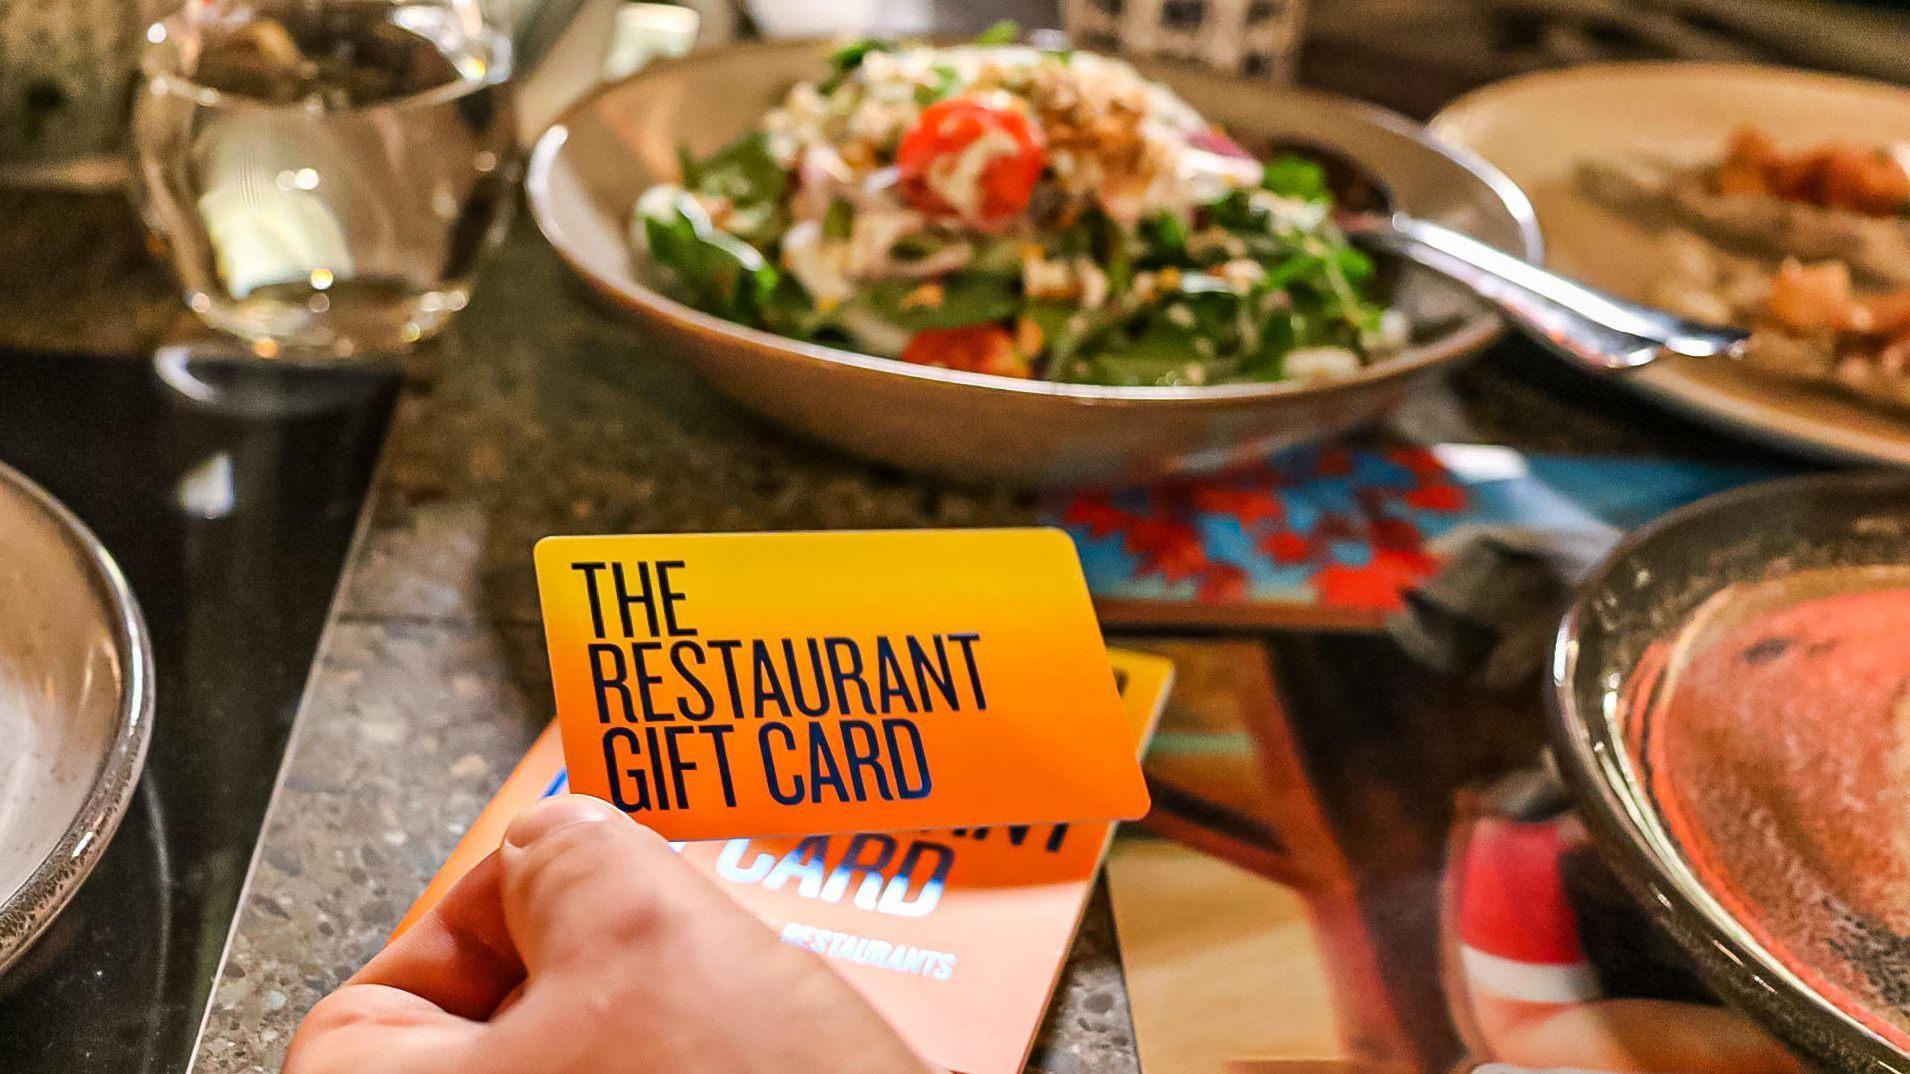 The Restaurant Gift Card